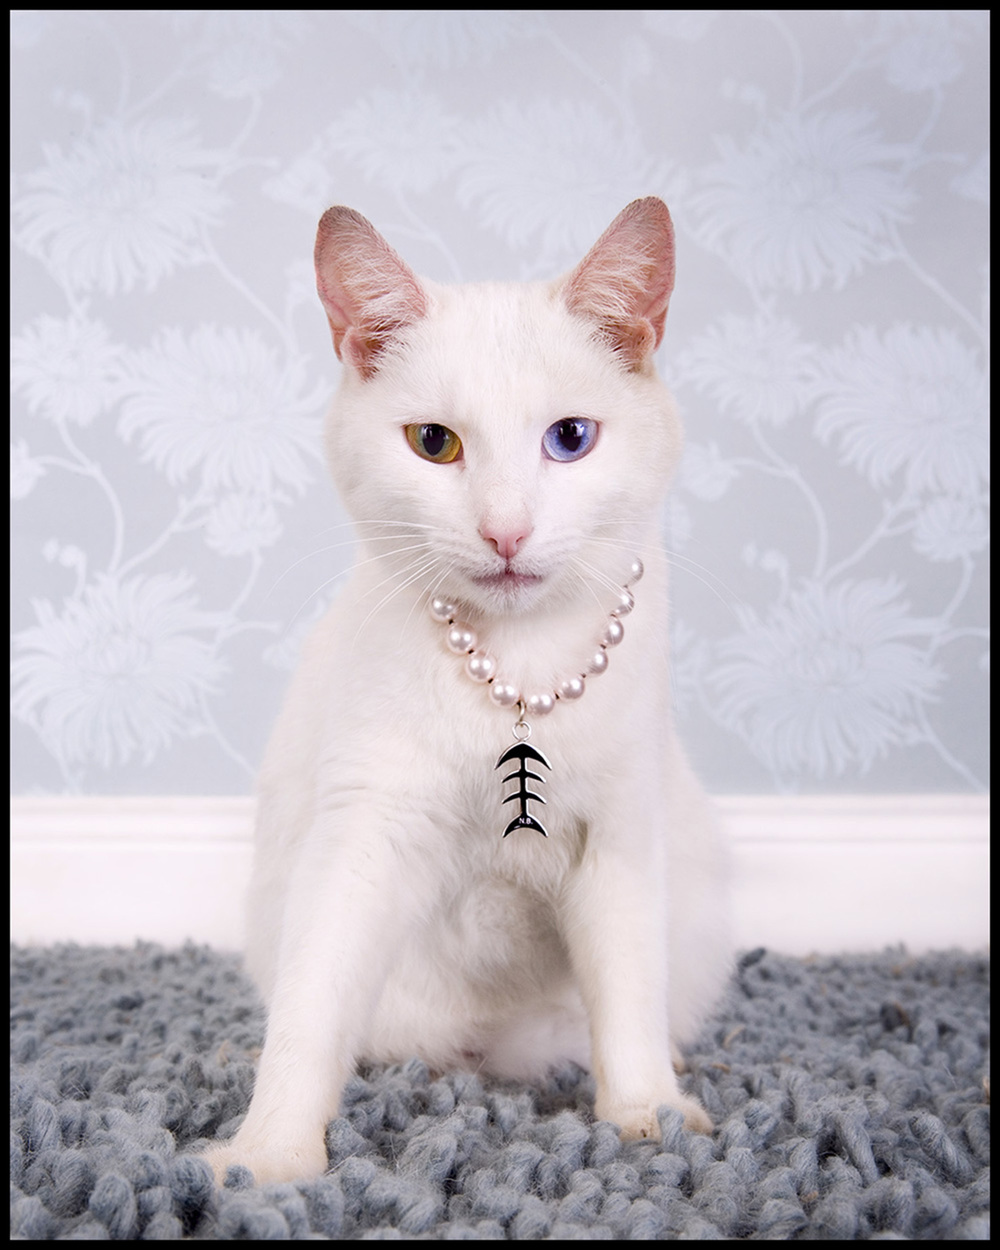 Cat Jewellery for Image Magazine